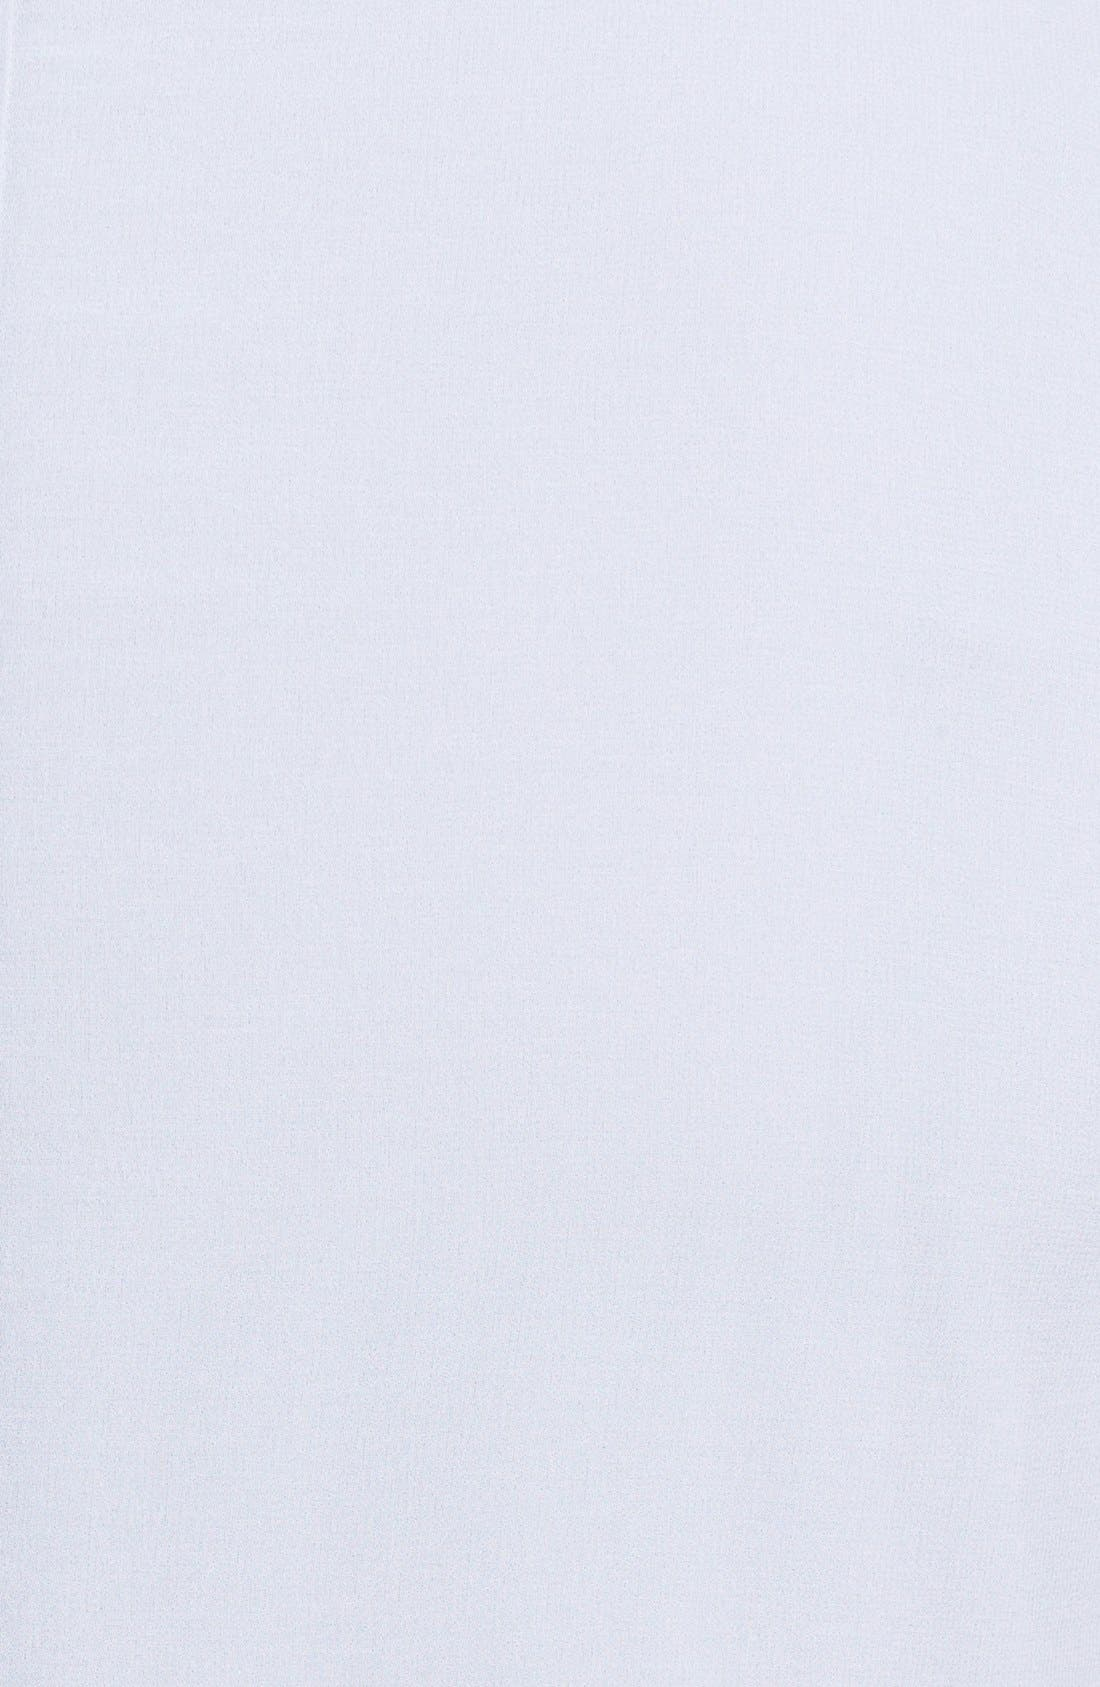 Alternate Image 3  - Evans Embellished Cuff Chiffon Blouse (Plus Size)